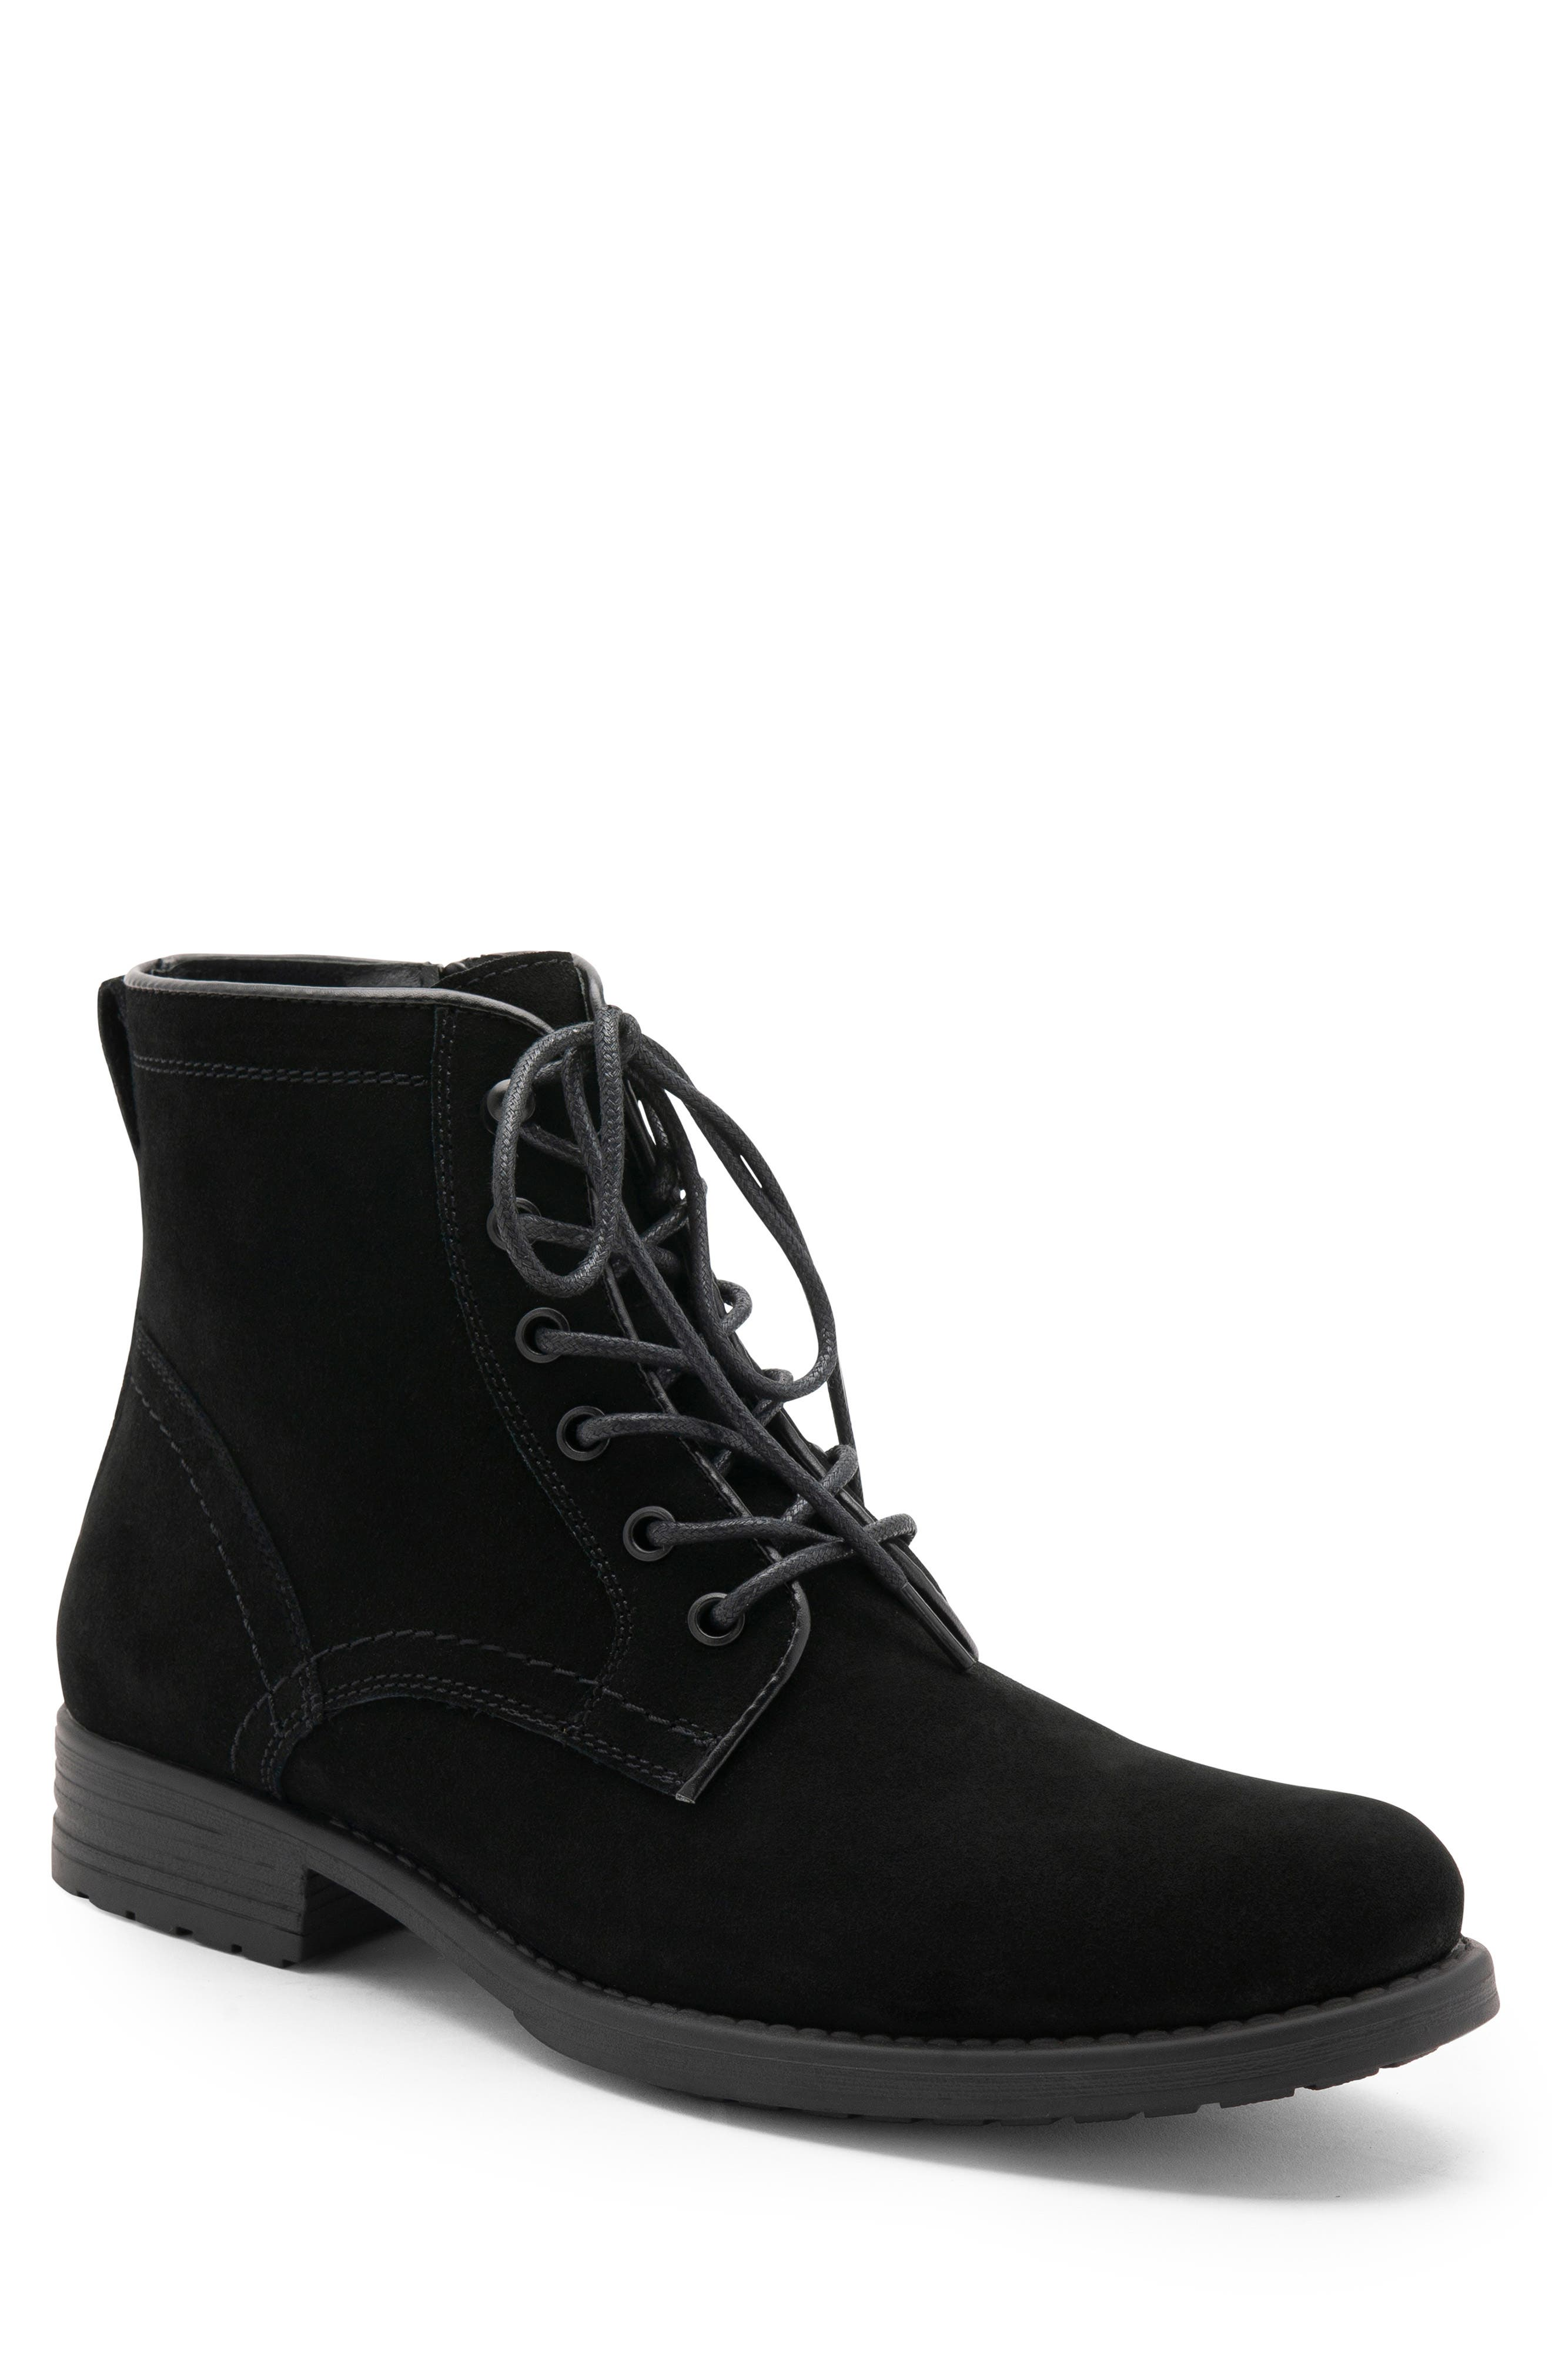 Blondo Peter Waterproof Plain Toe Boot- Black